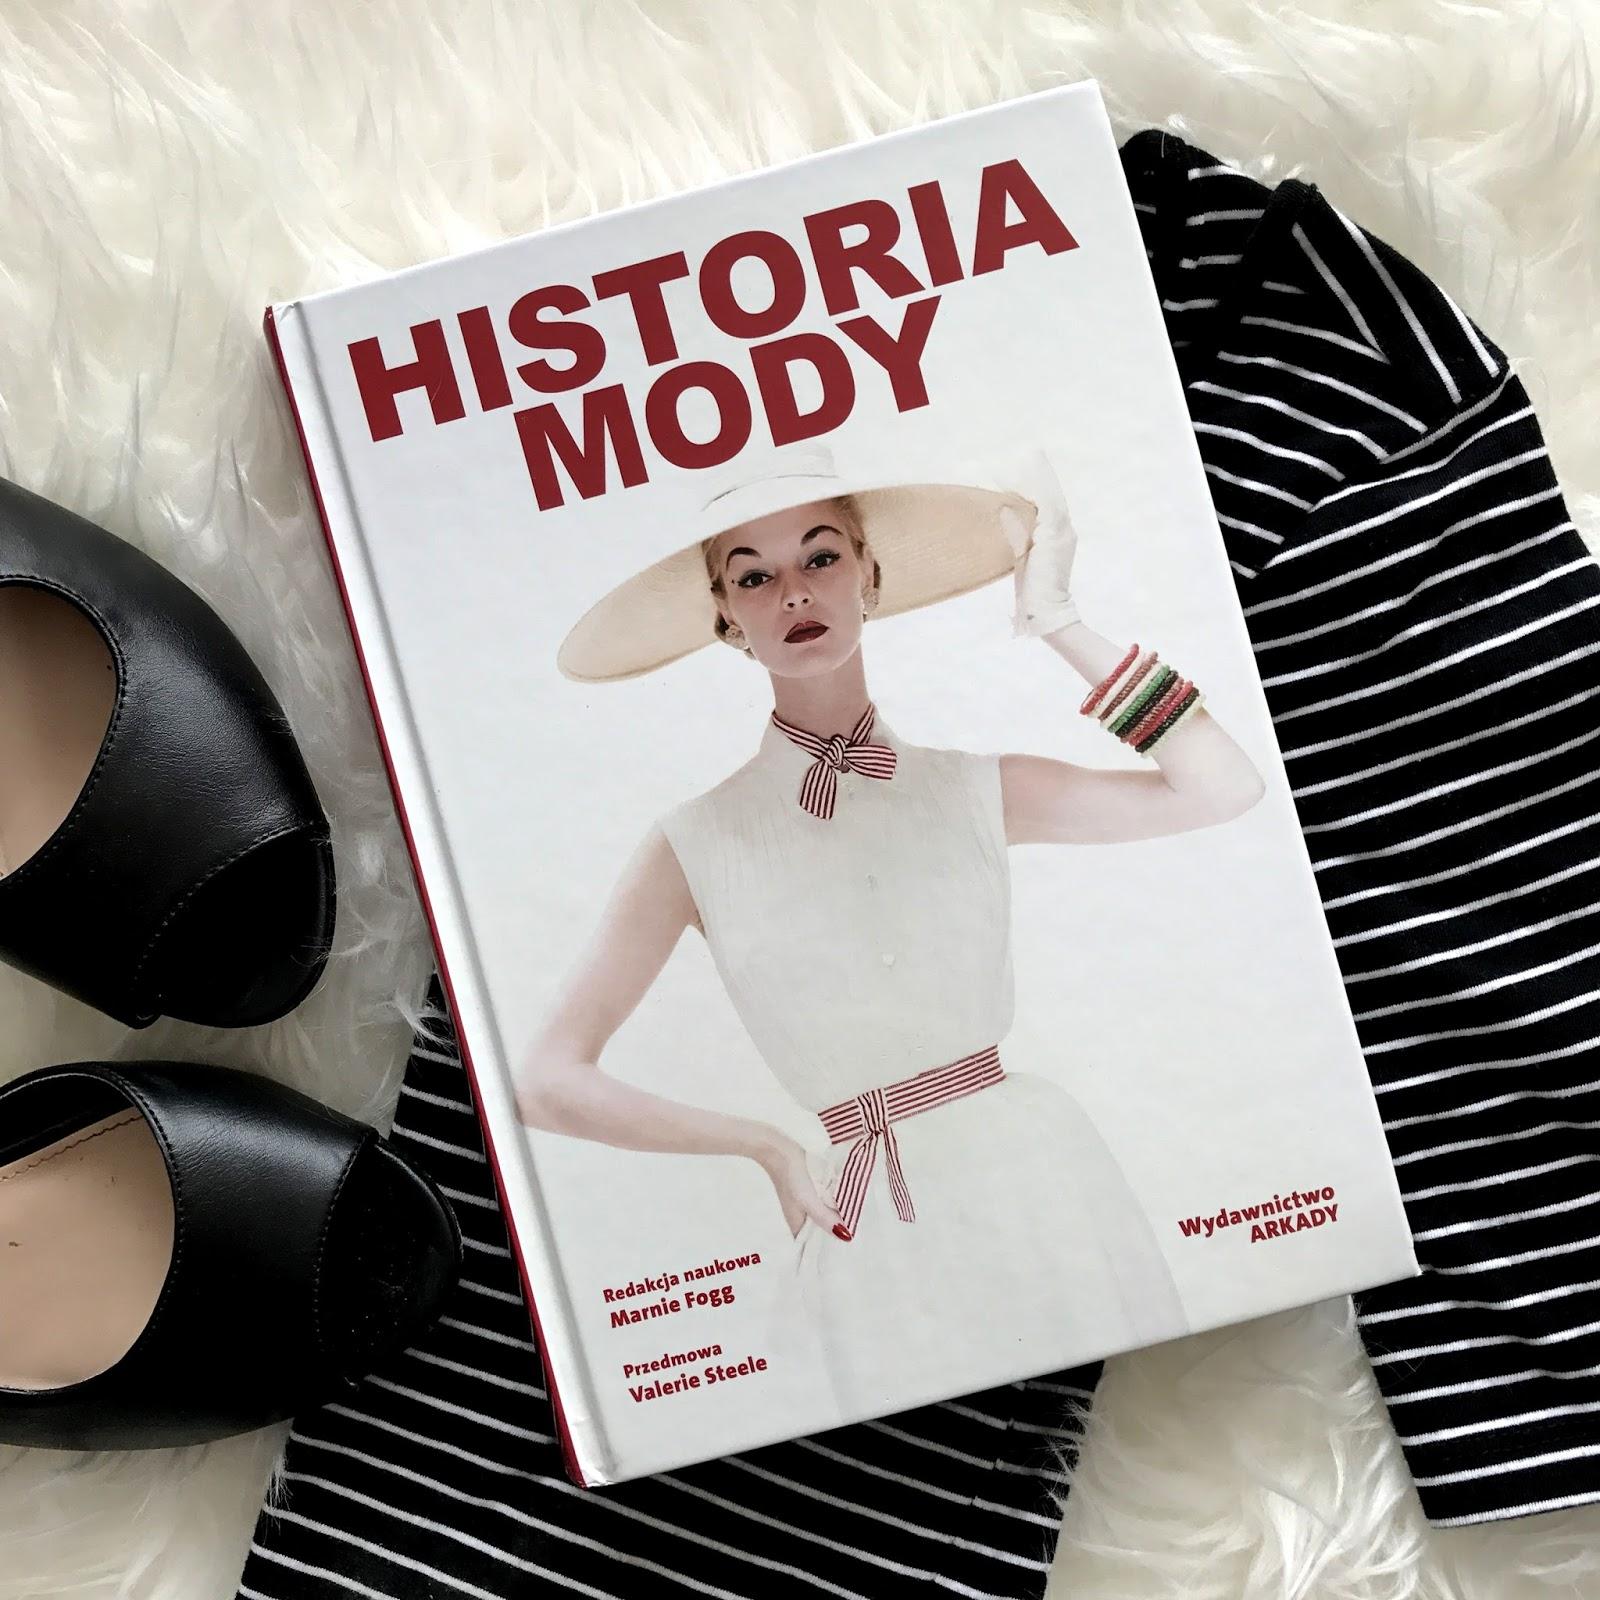 Marnie Fogg, Historia mody